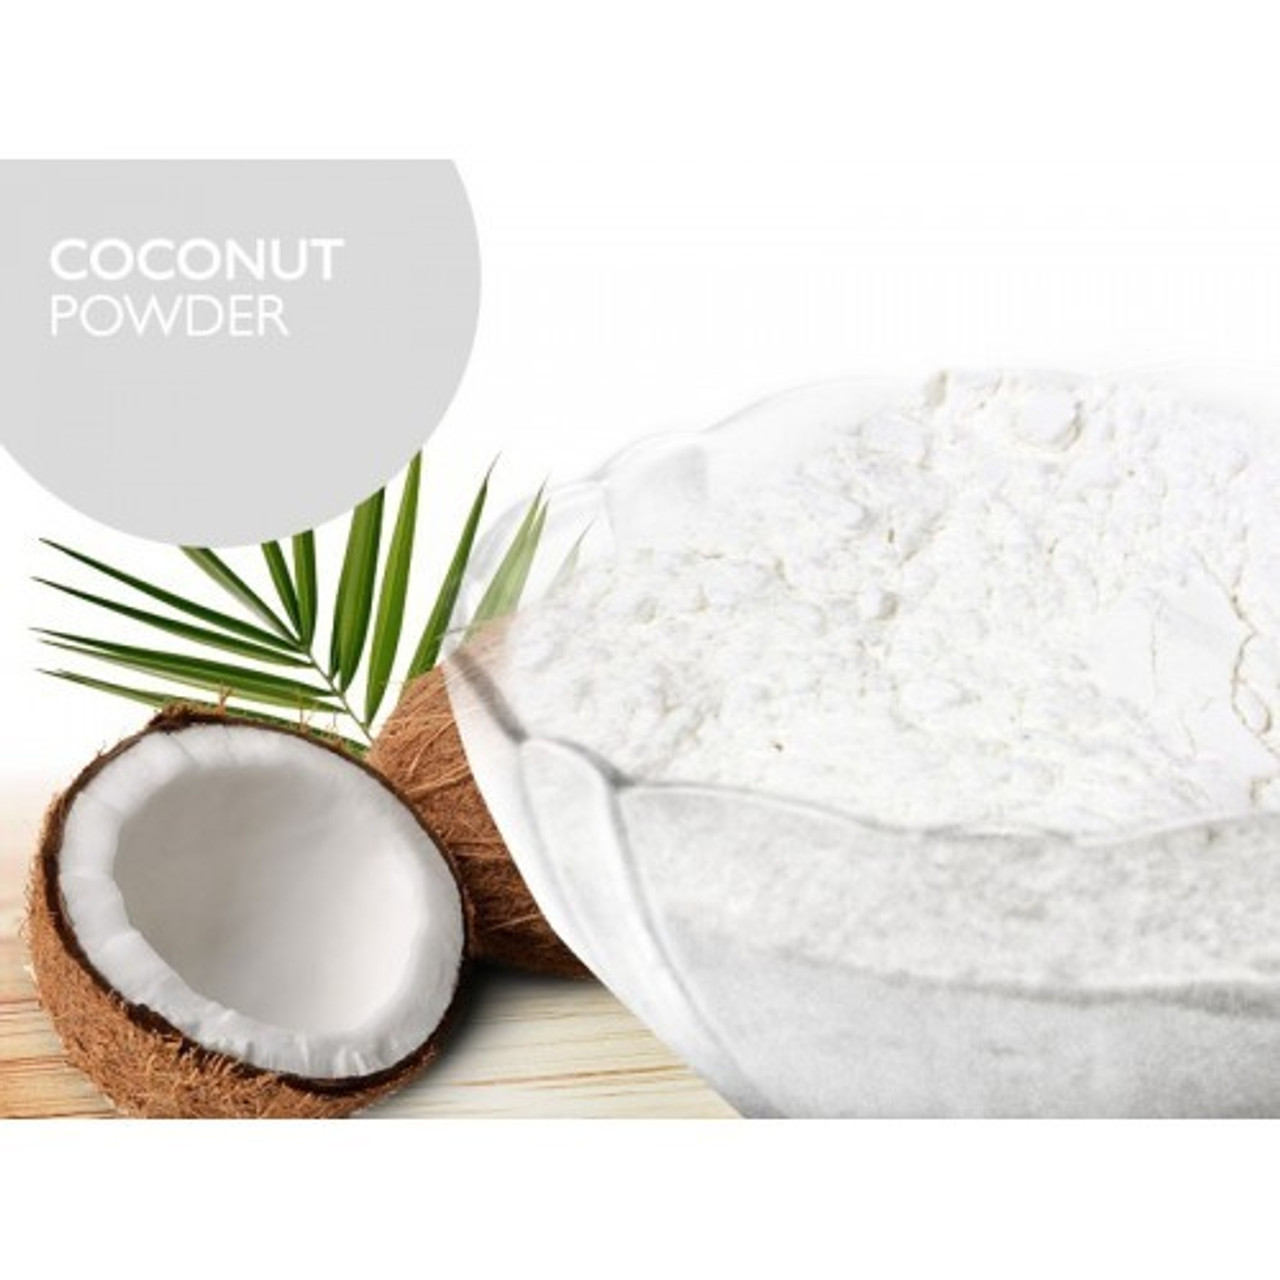 Coconut Powder & Flakes